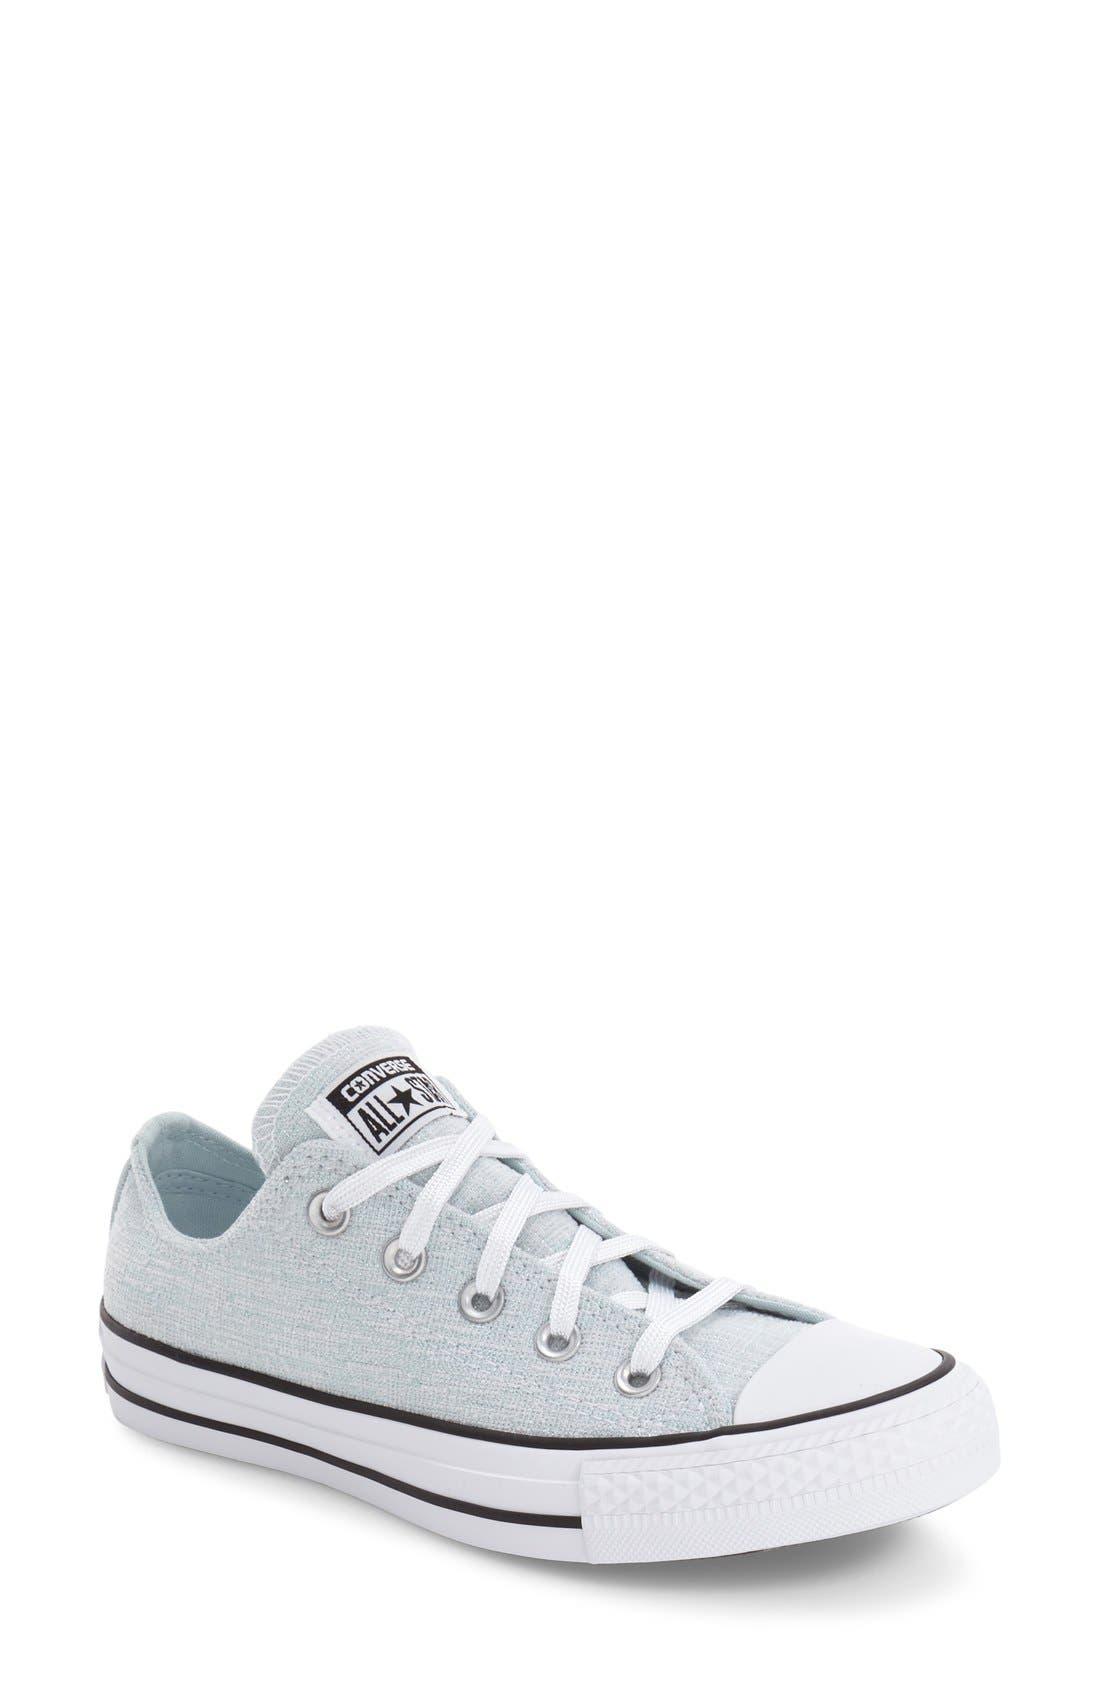 Main Image - Converse Chuck Taylor® All Star® Chuck Ox Knit Low Top Sneaker (Women)